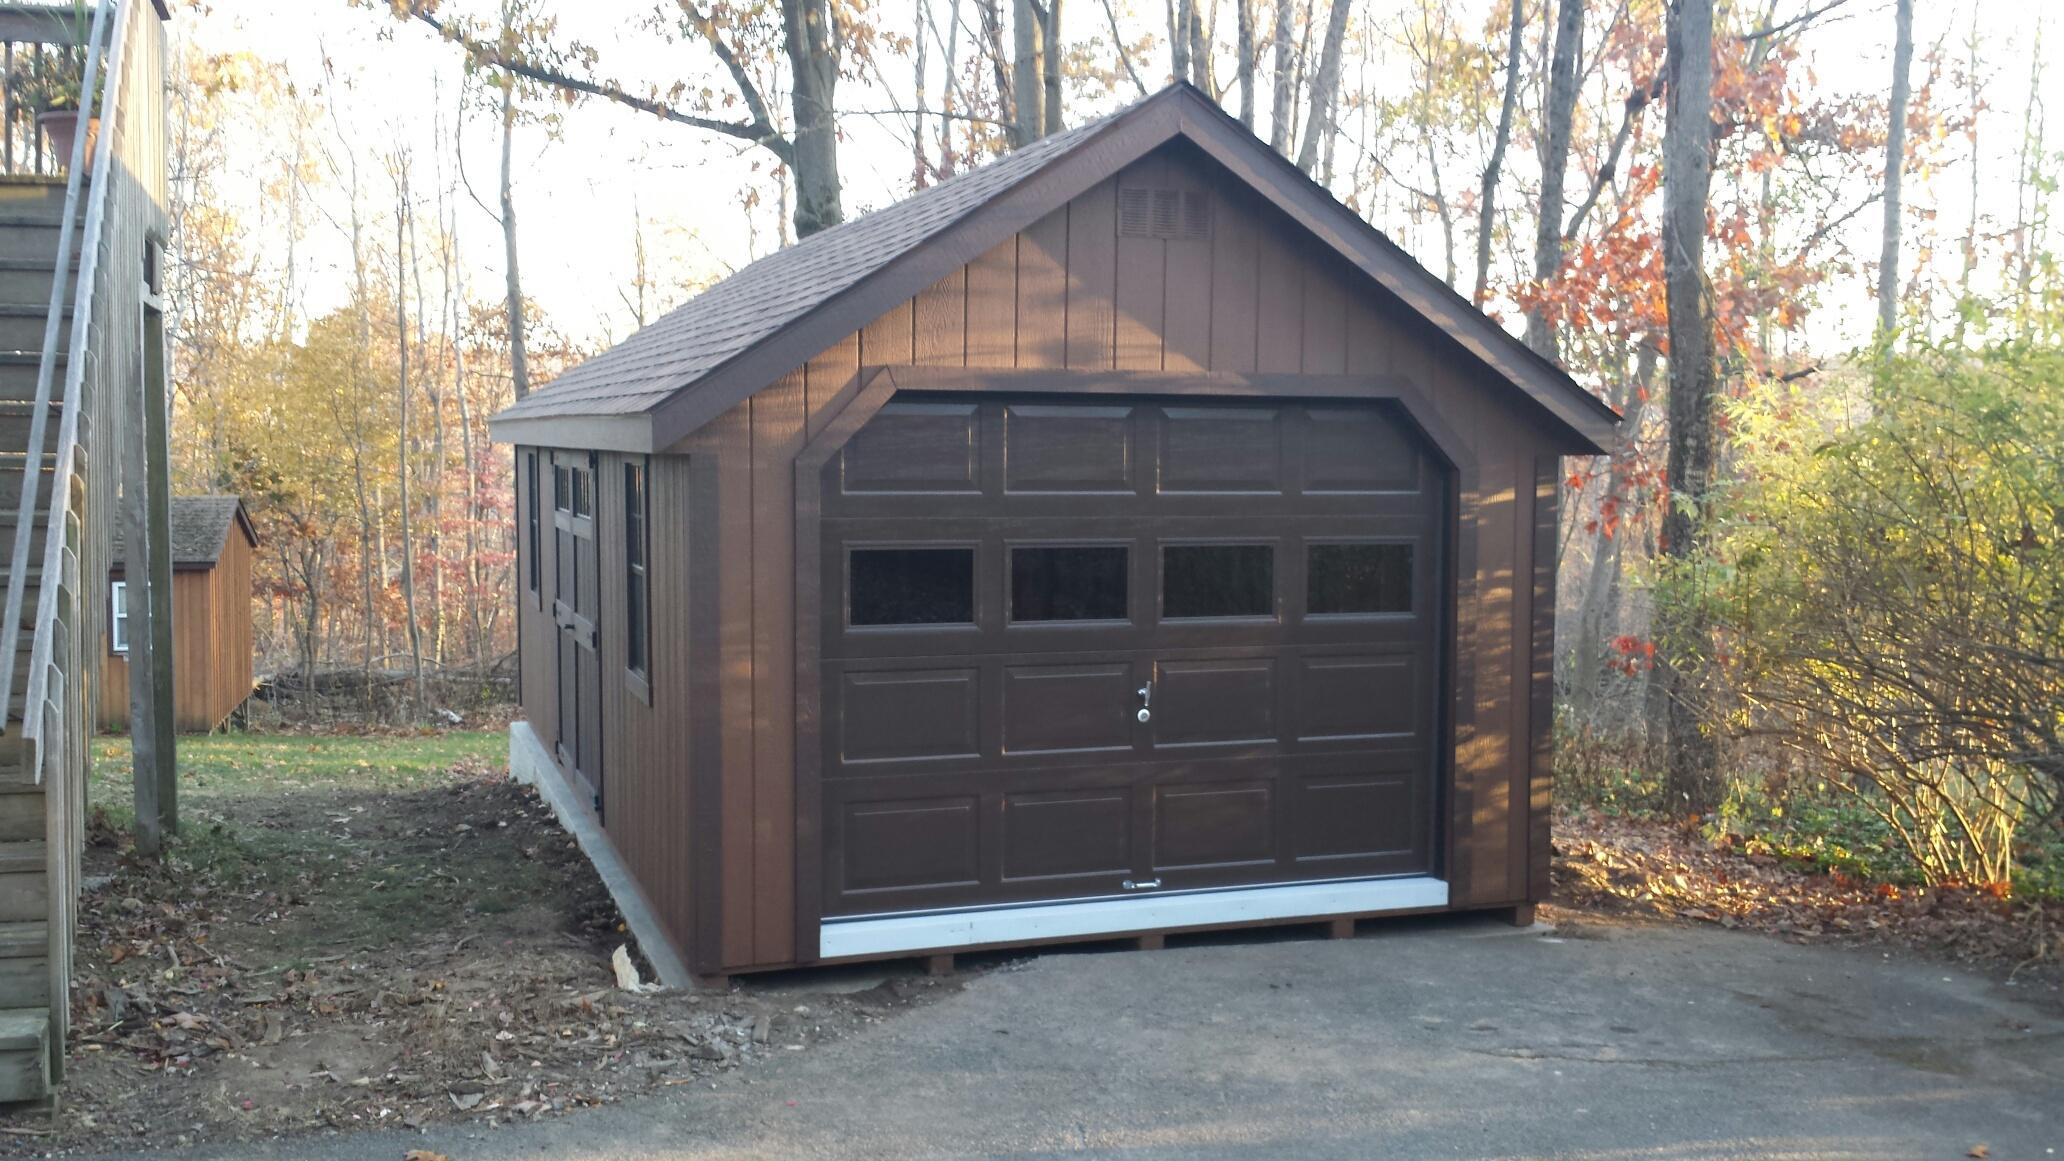 New England Garages Amish Mike Amish Sheds Amish Barns